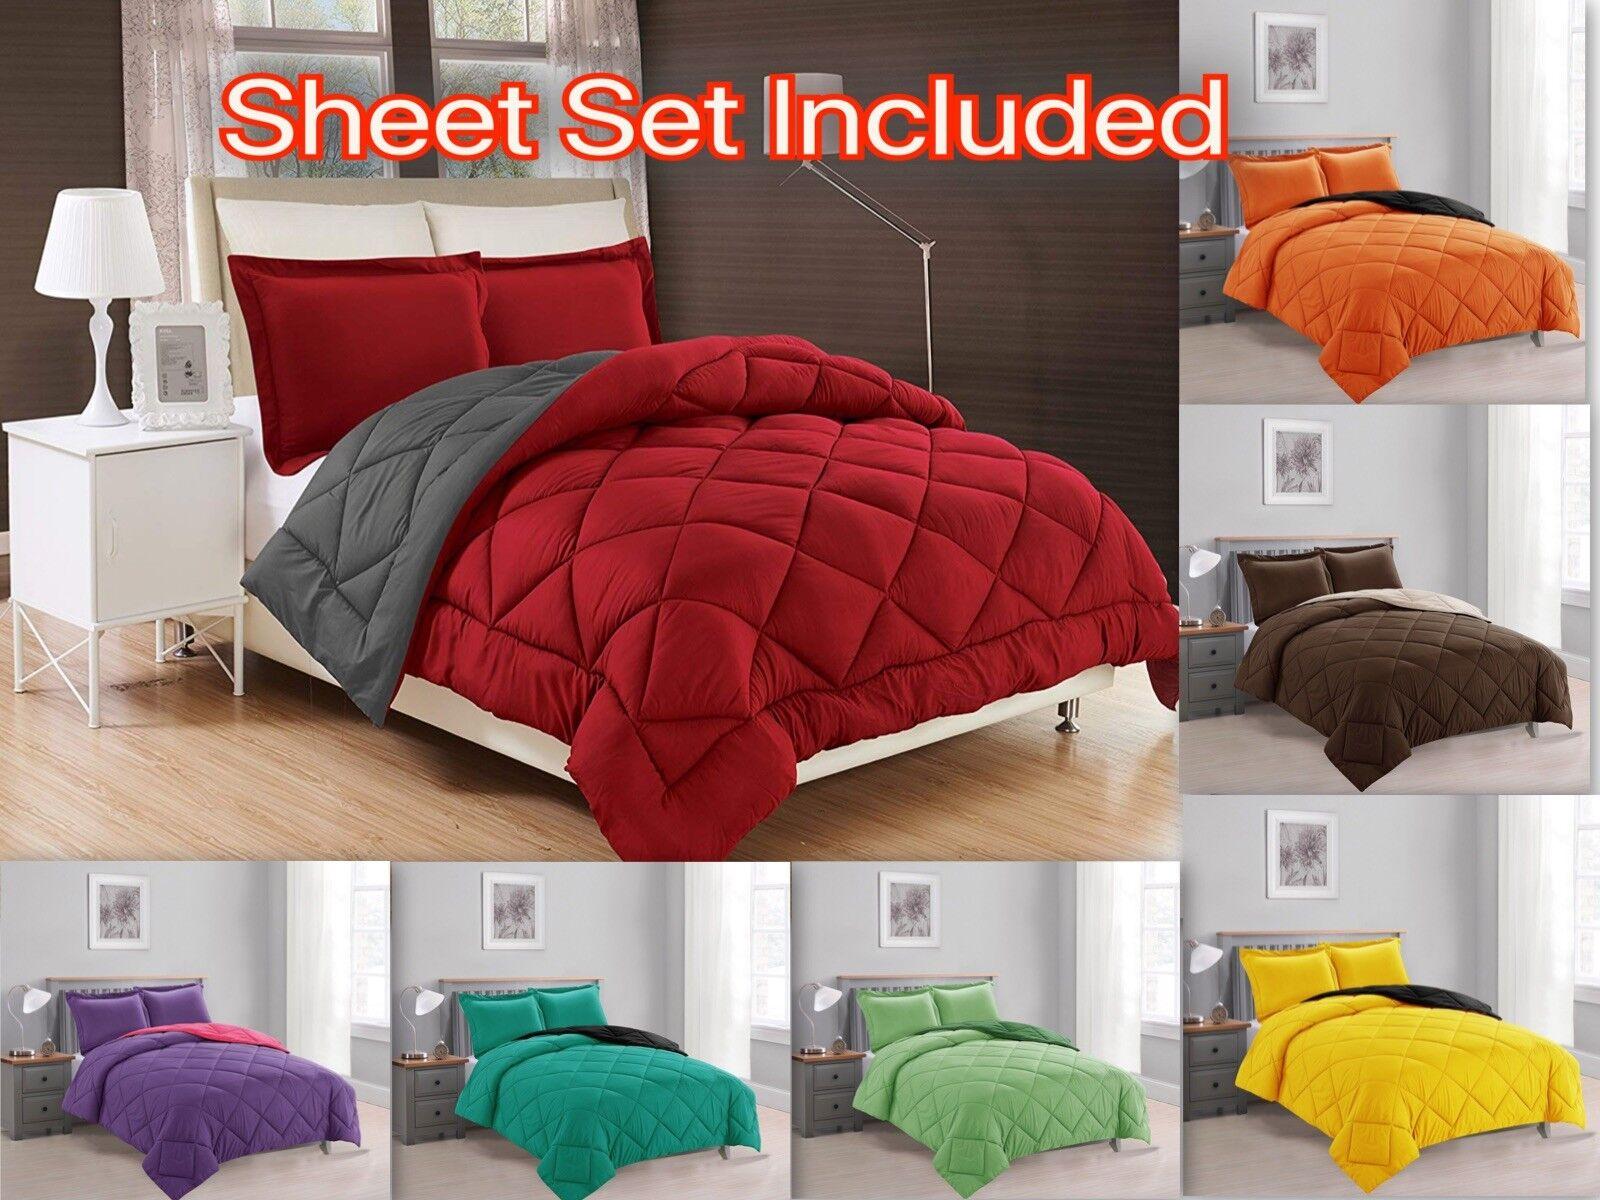 Down Alternative Comforter Set 7-PC Reversible ALL Season Be